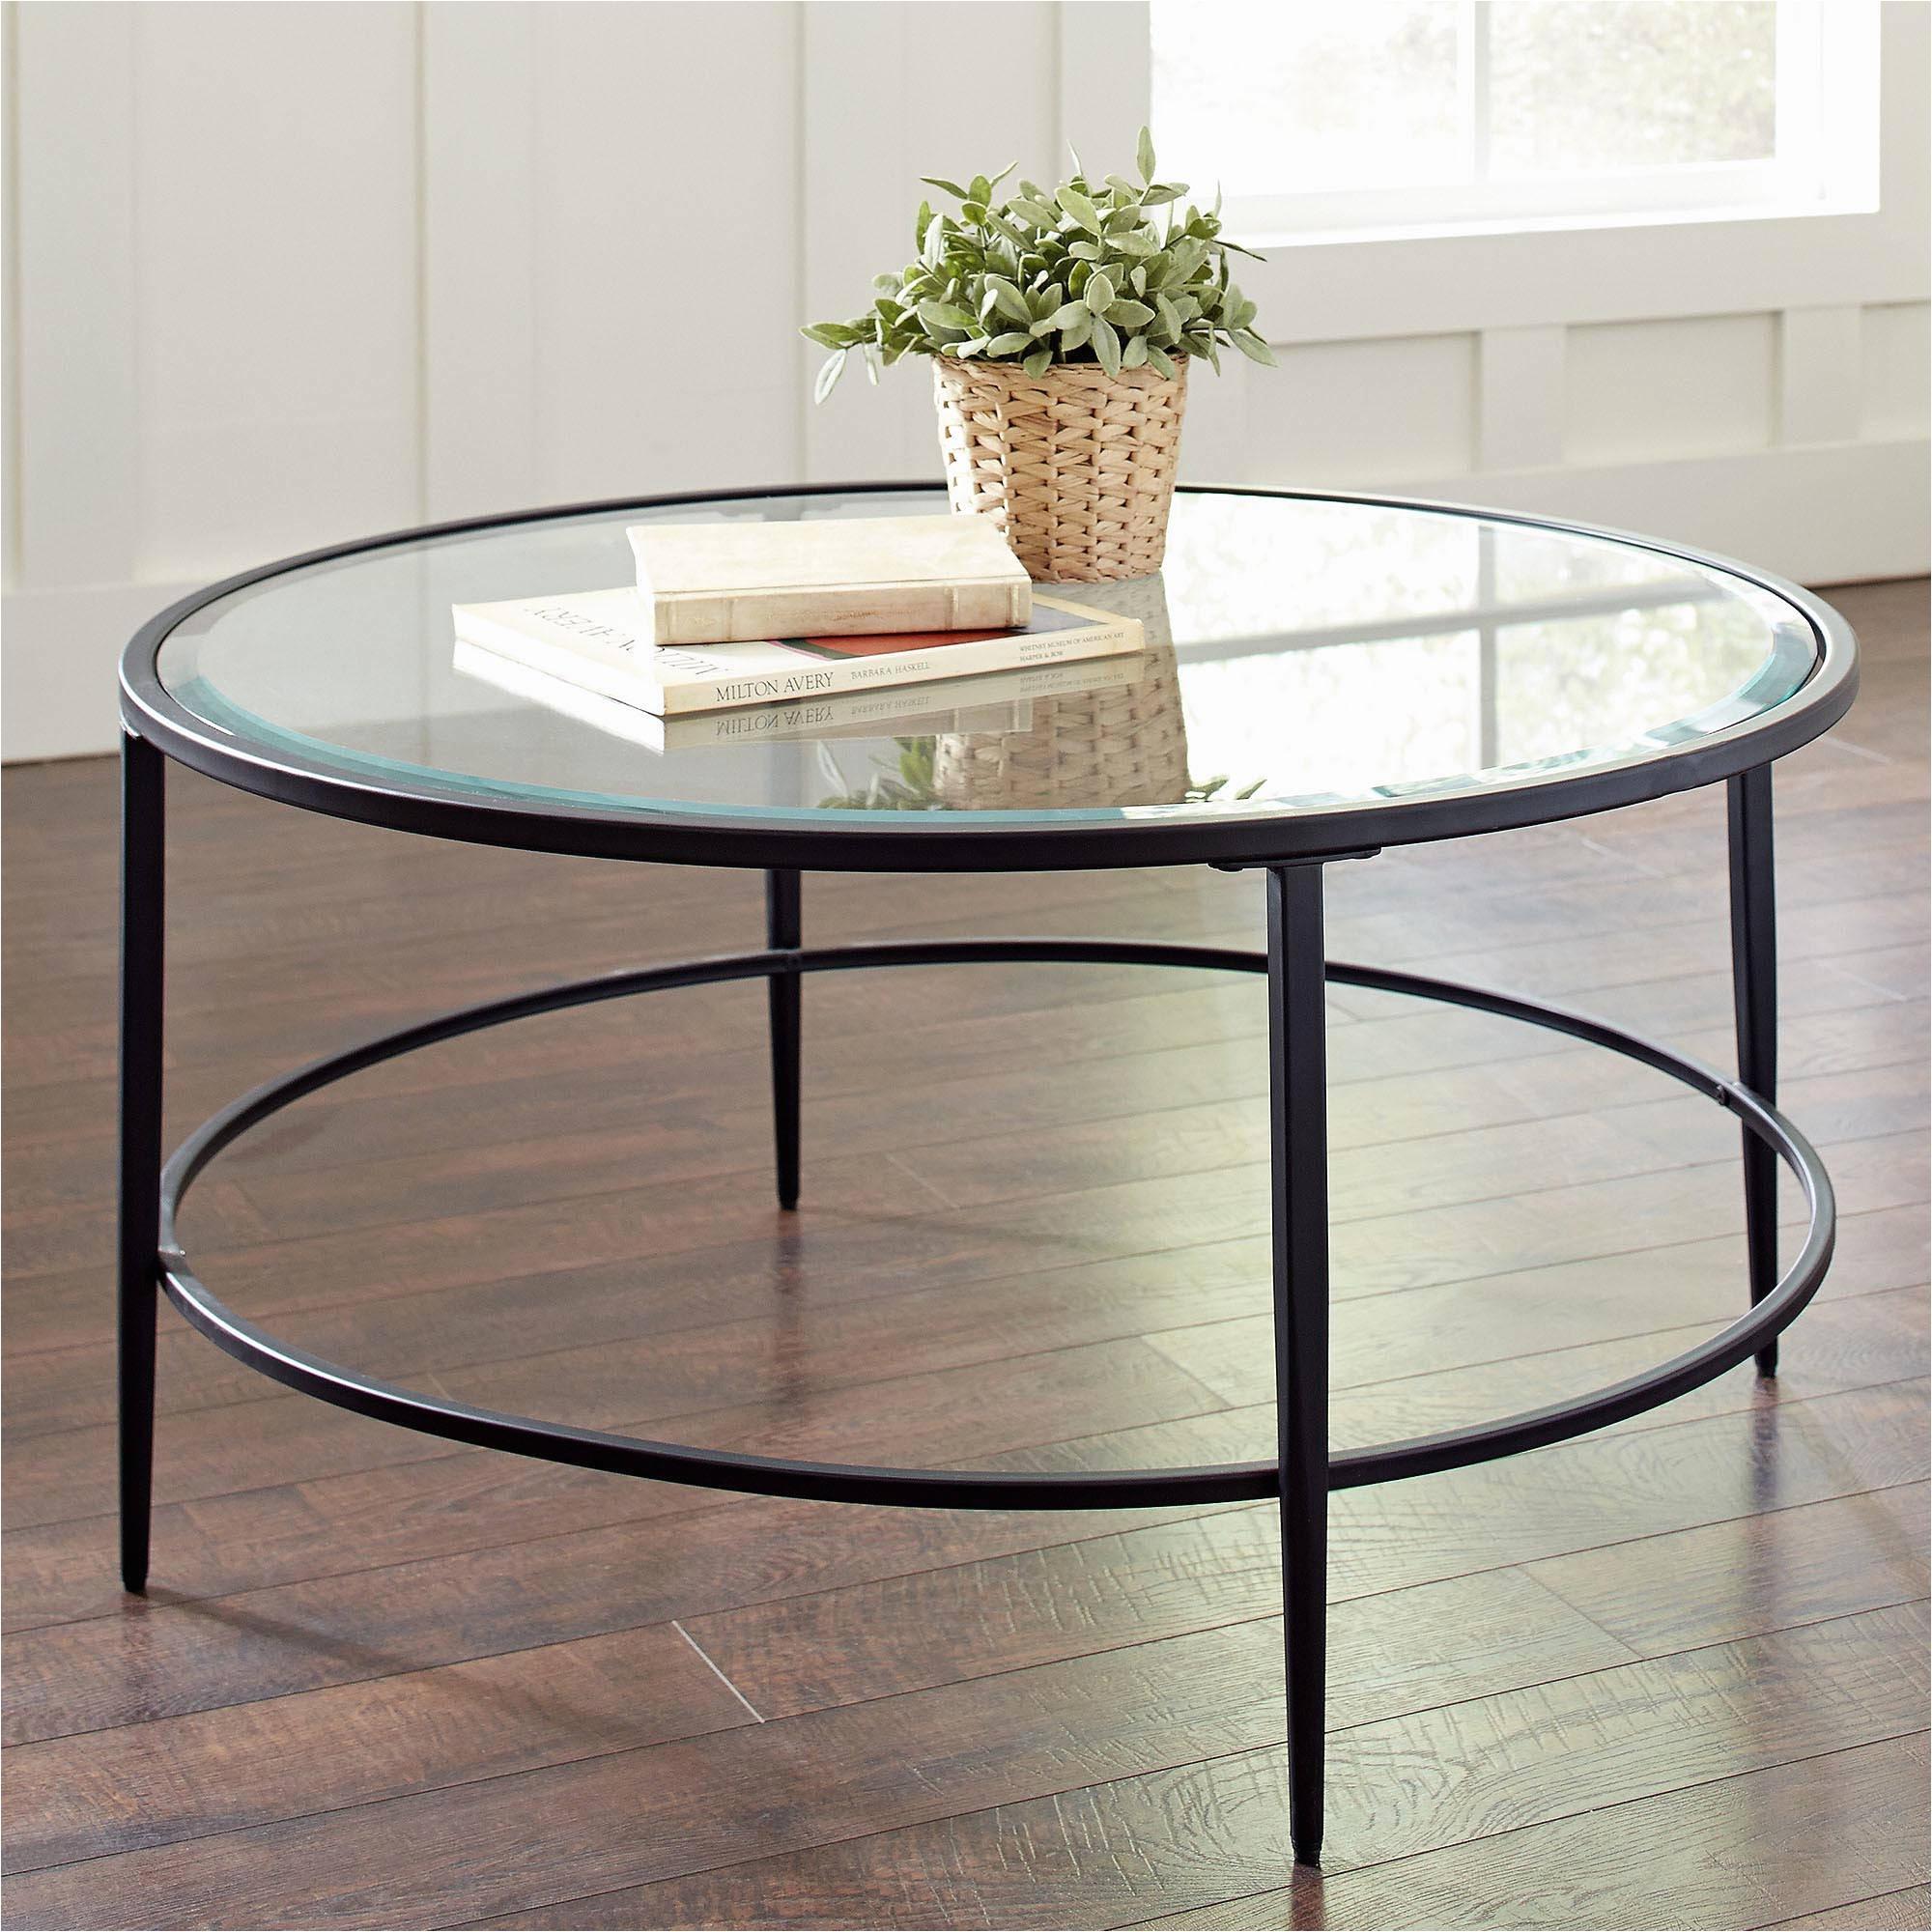 Adjustable Height Coffee Table Ikea Lovely 15 Adjustable Height Glass Coffee Table Inspiration